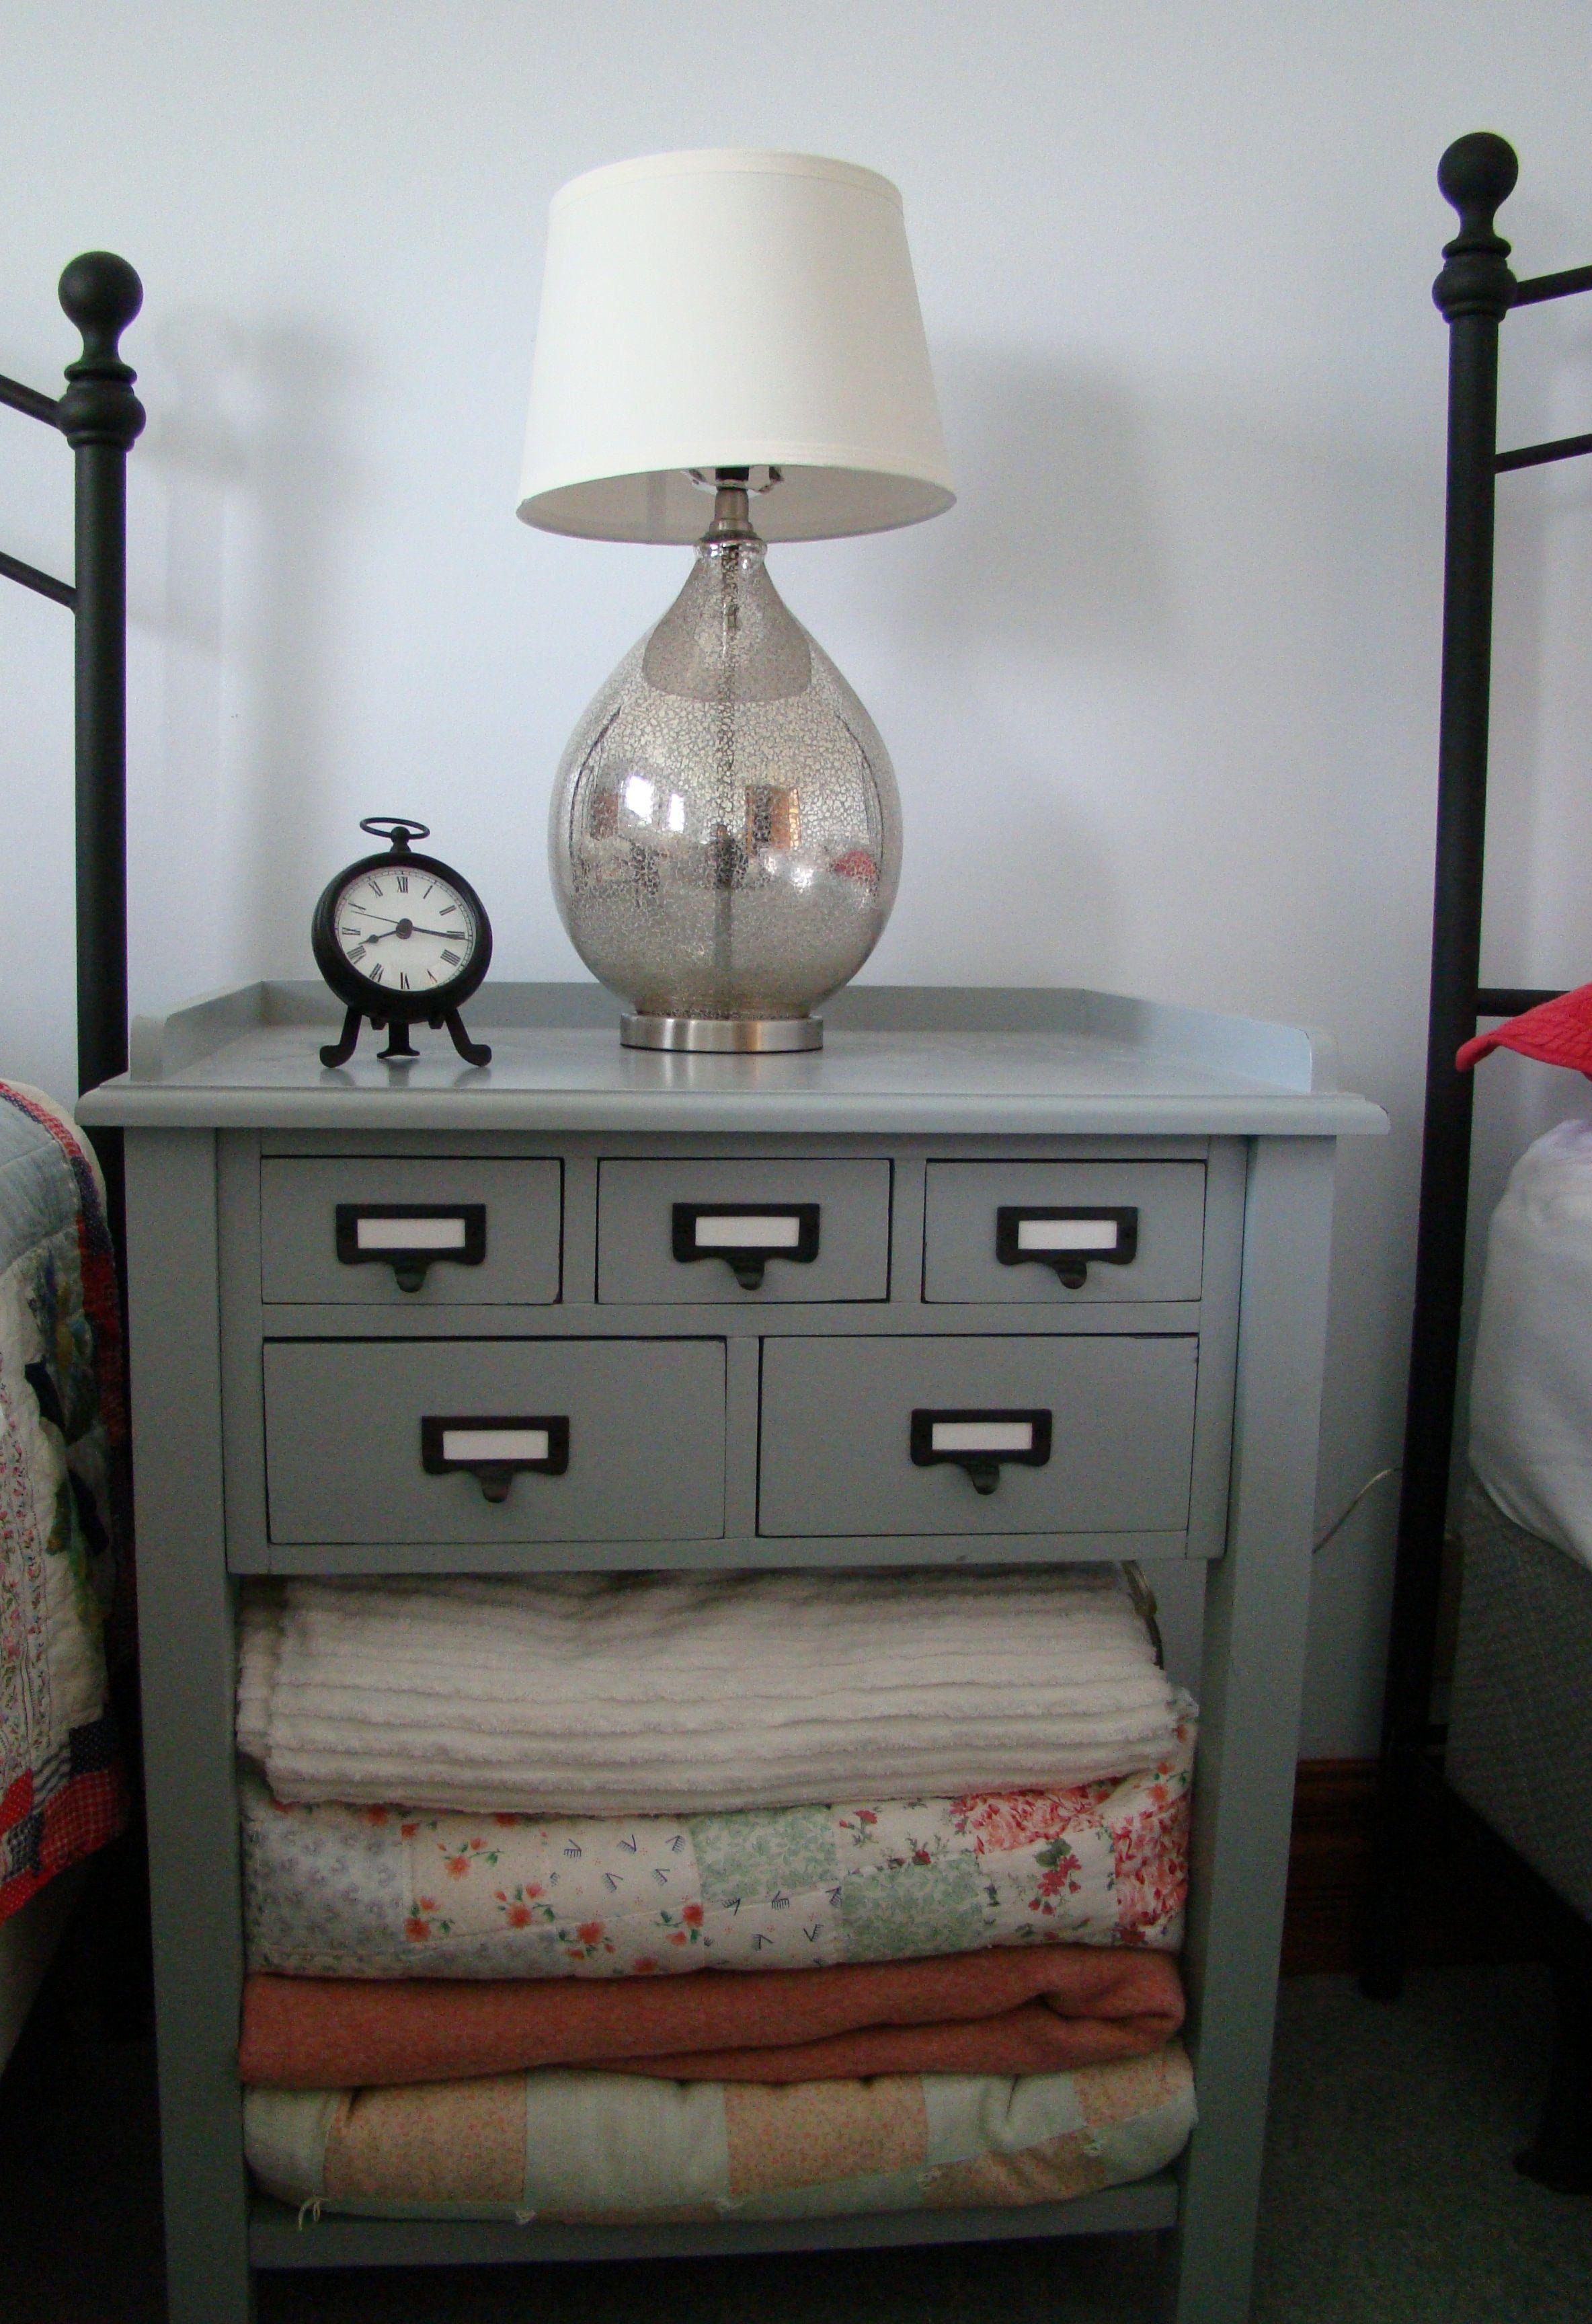 farm house bedroom, night stand, metallic lamp, small